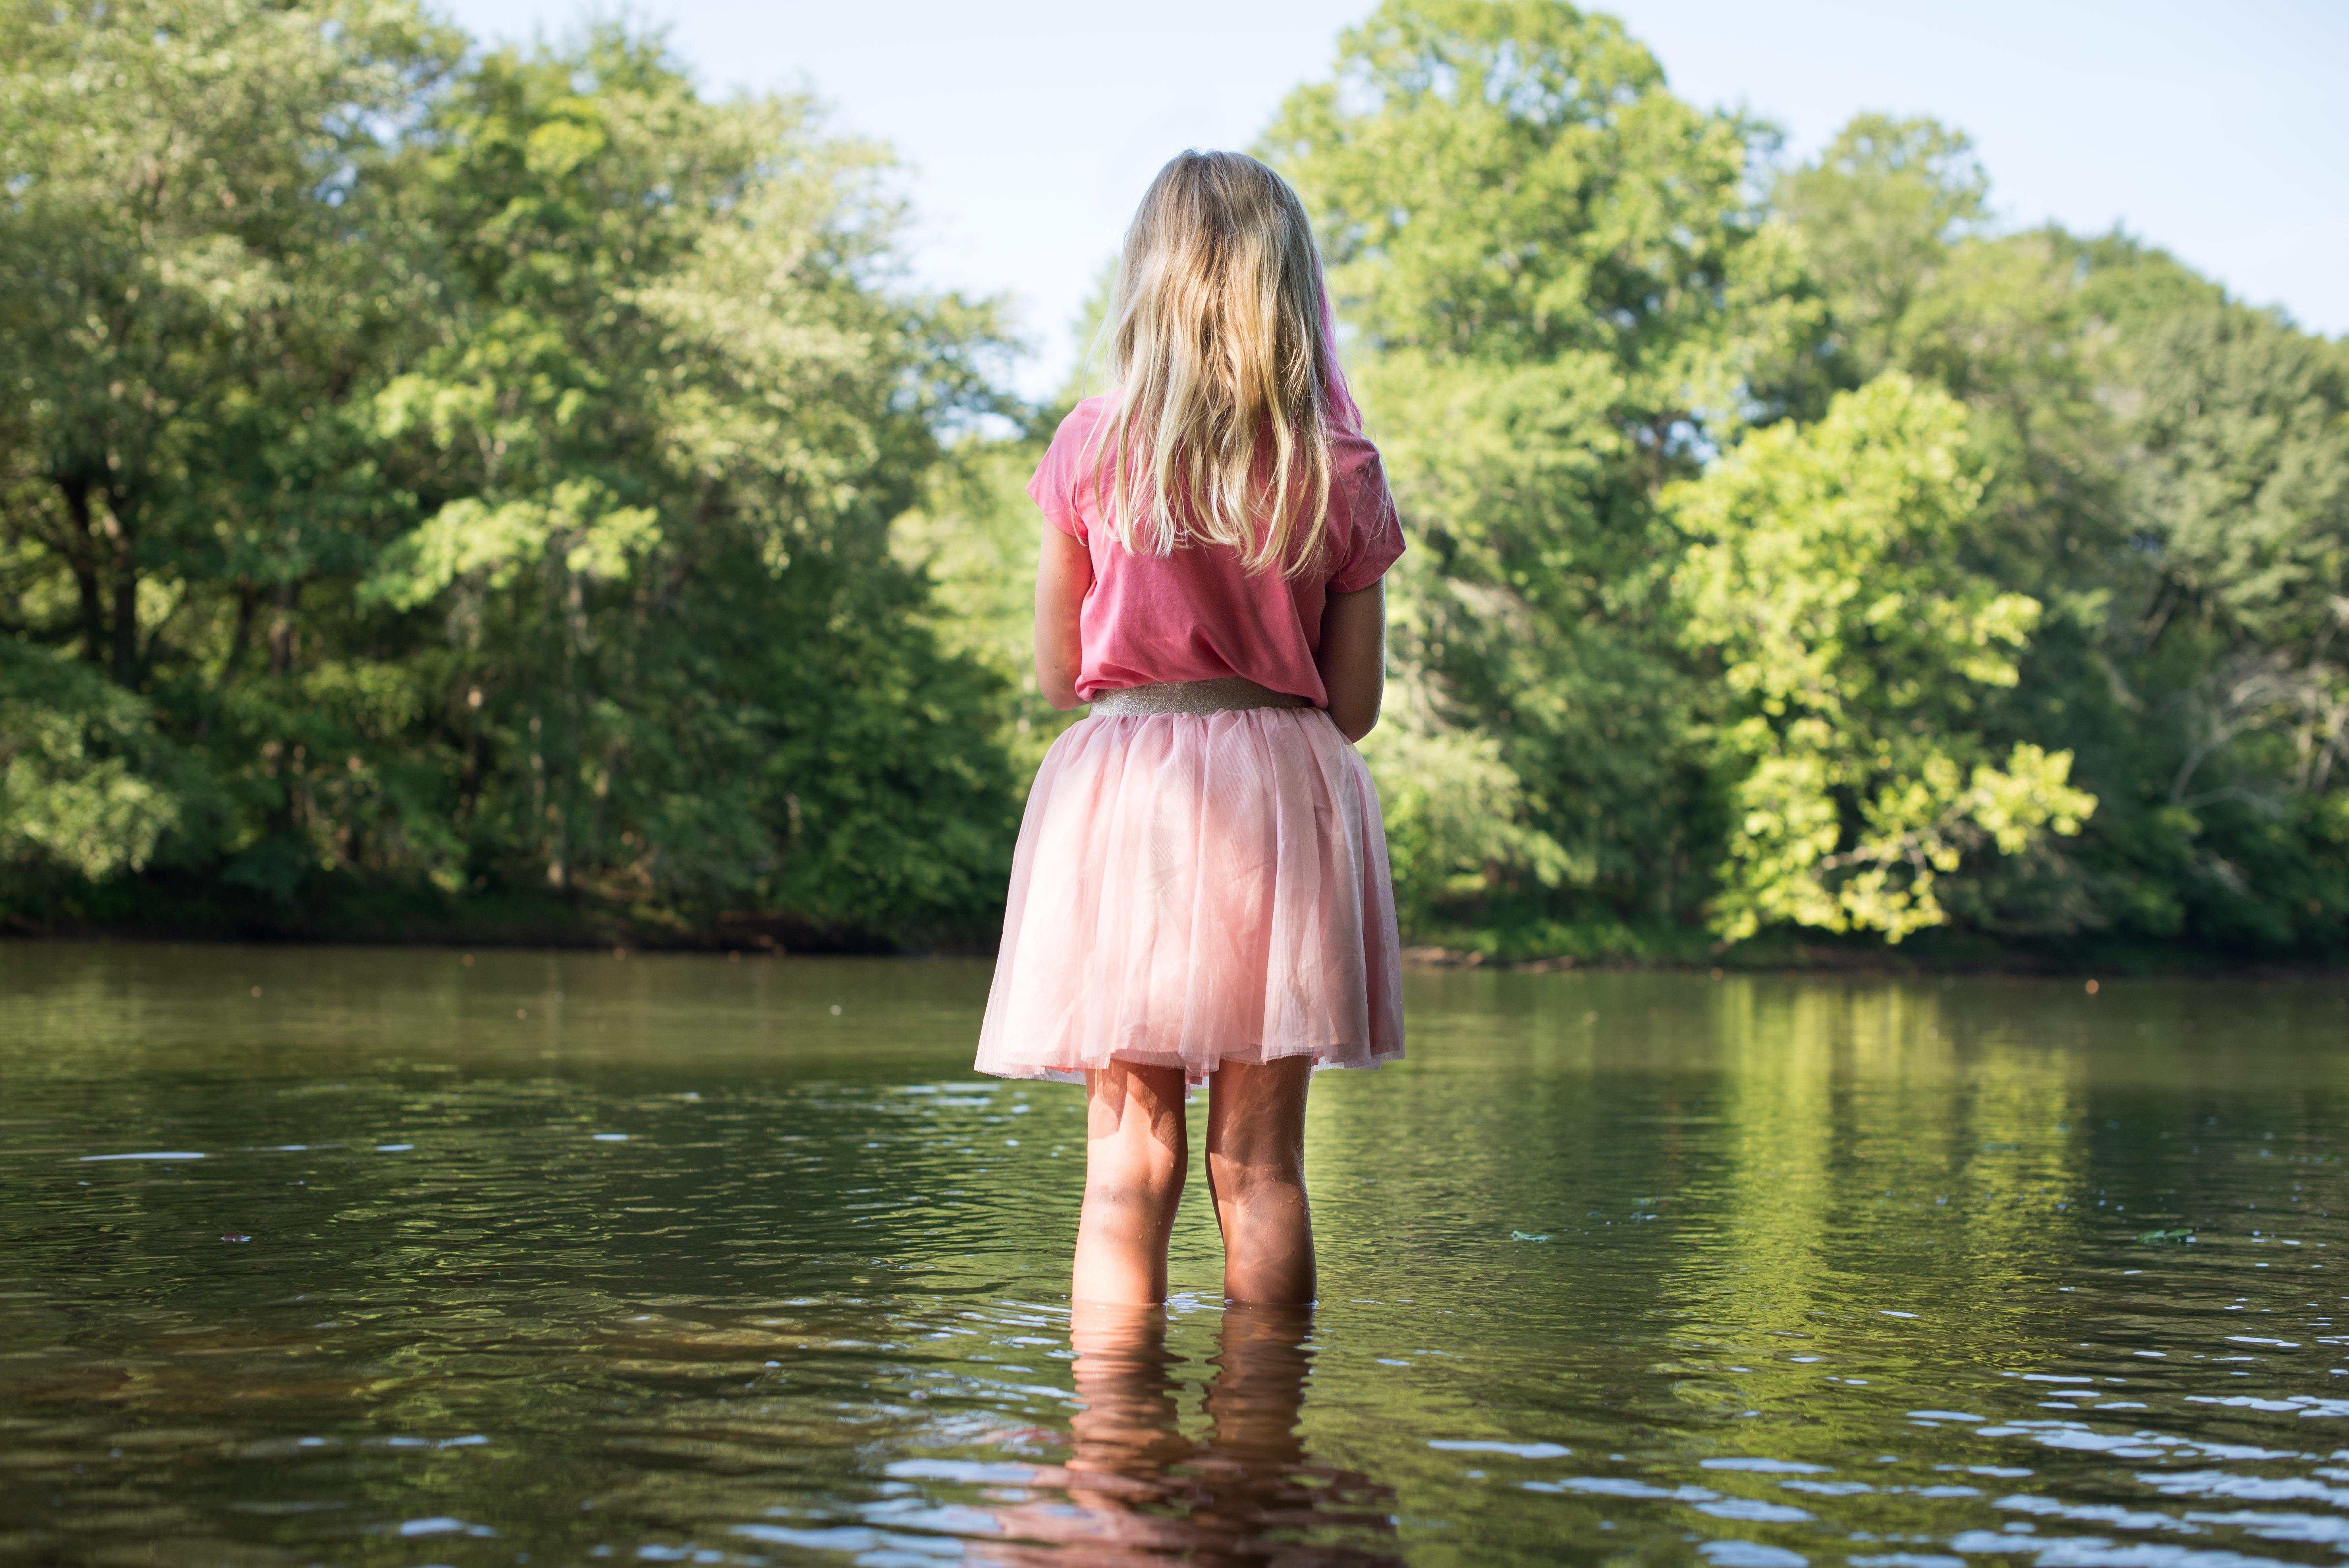 candid kids portrait photogrpahy roswll georgia 2